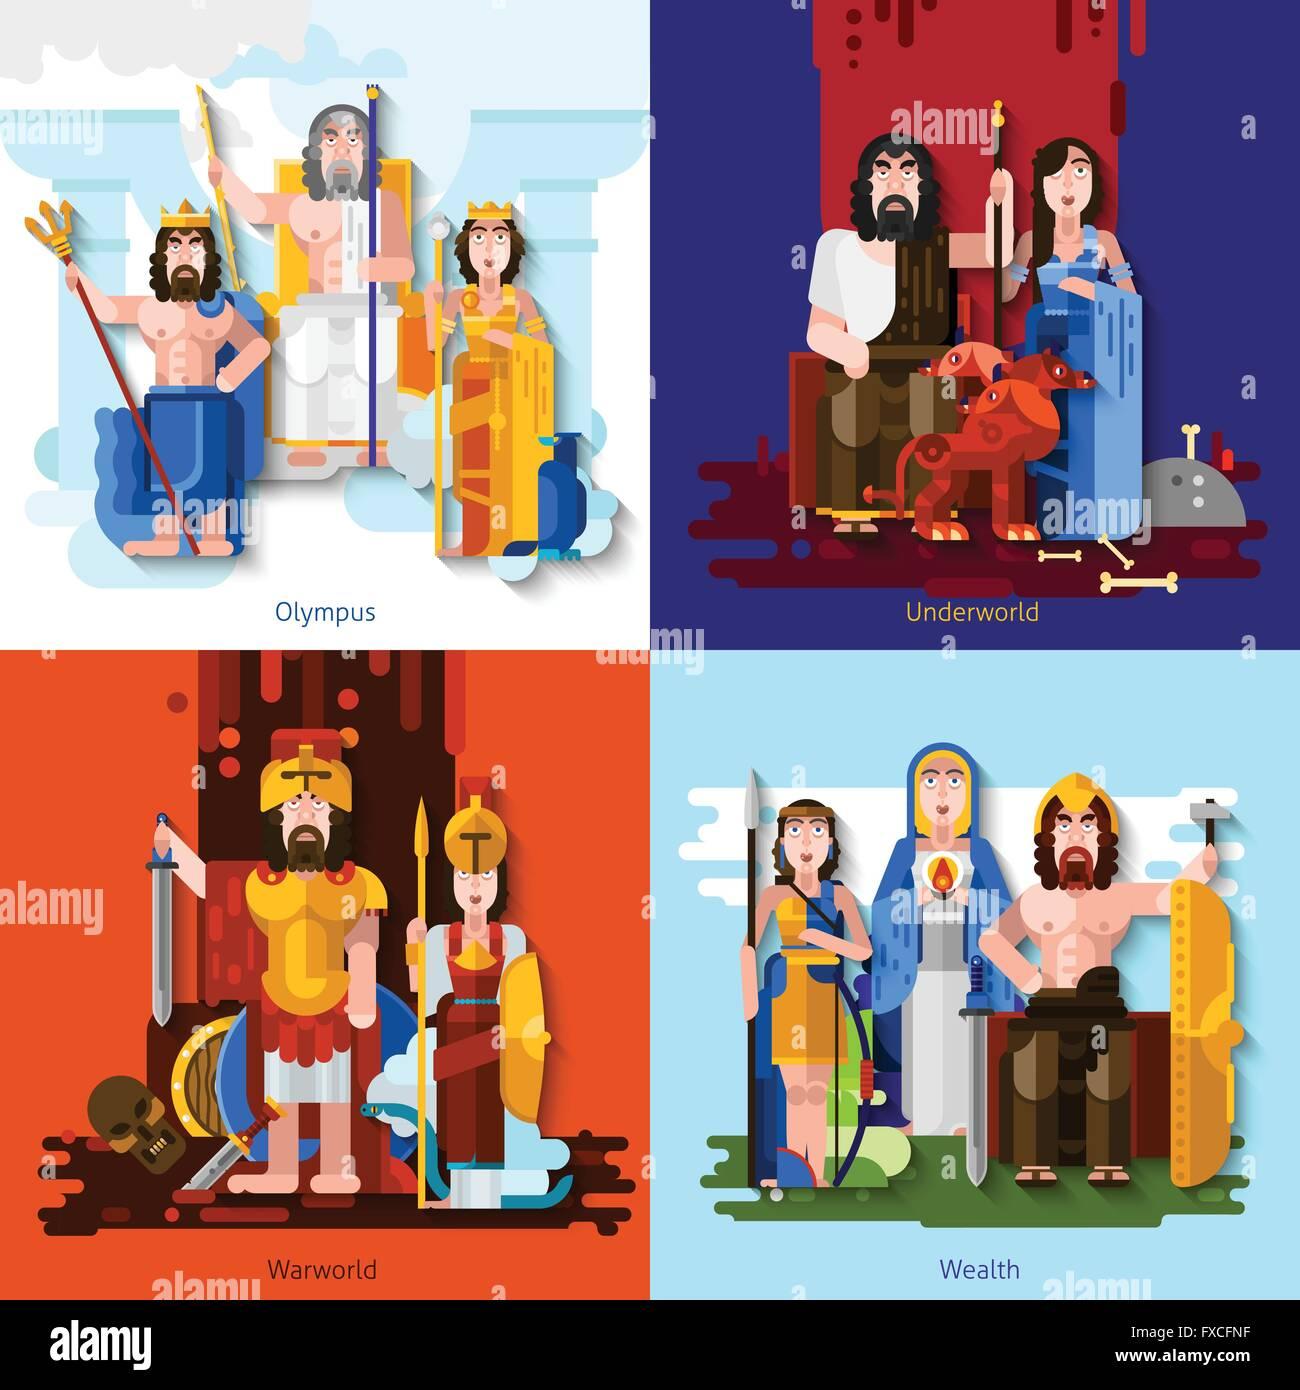 Olympic Gods 2x2 Cartoon Concept - Stock Image